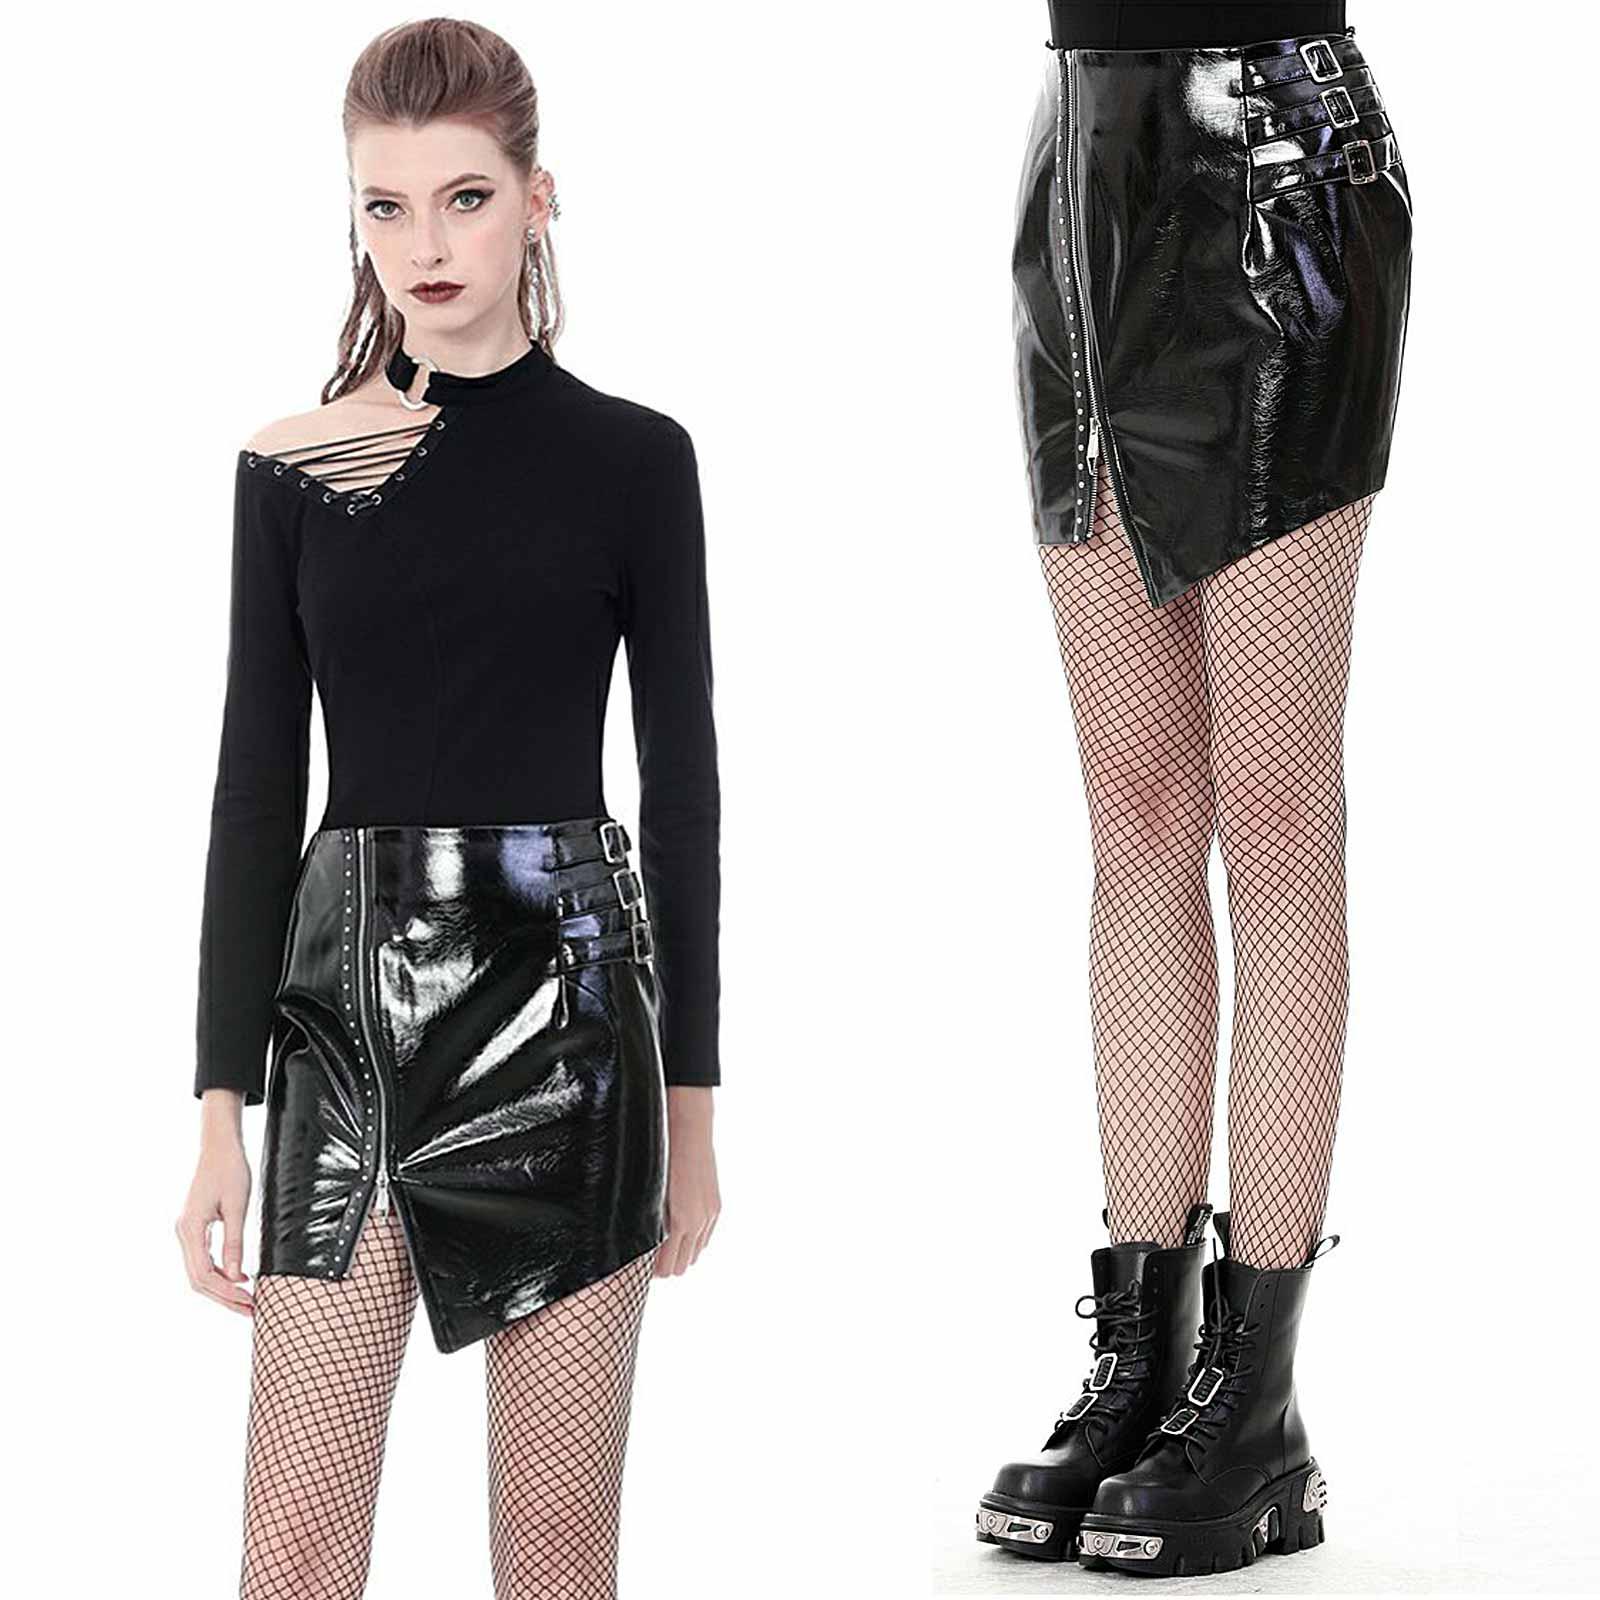 DARK IN LOVE Vinyl Mini Skirt Asymmetric